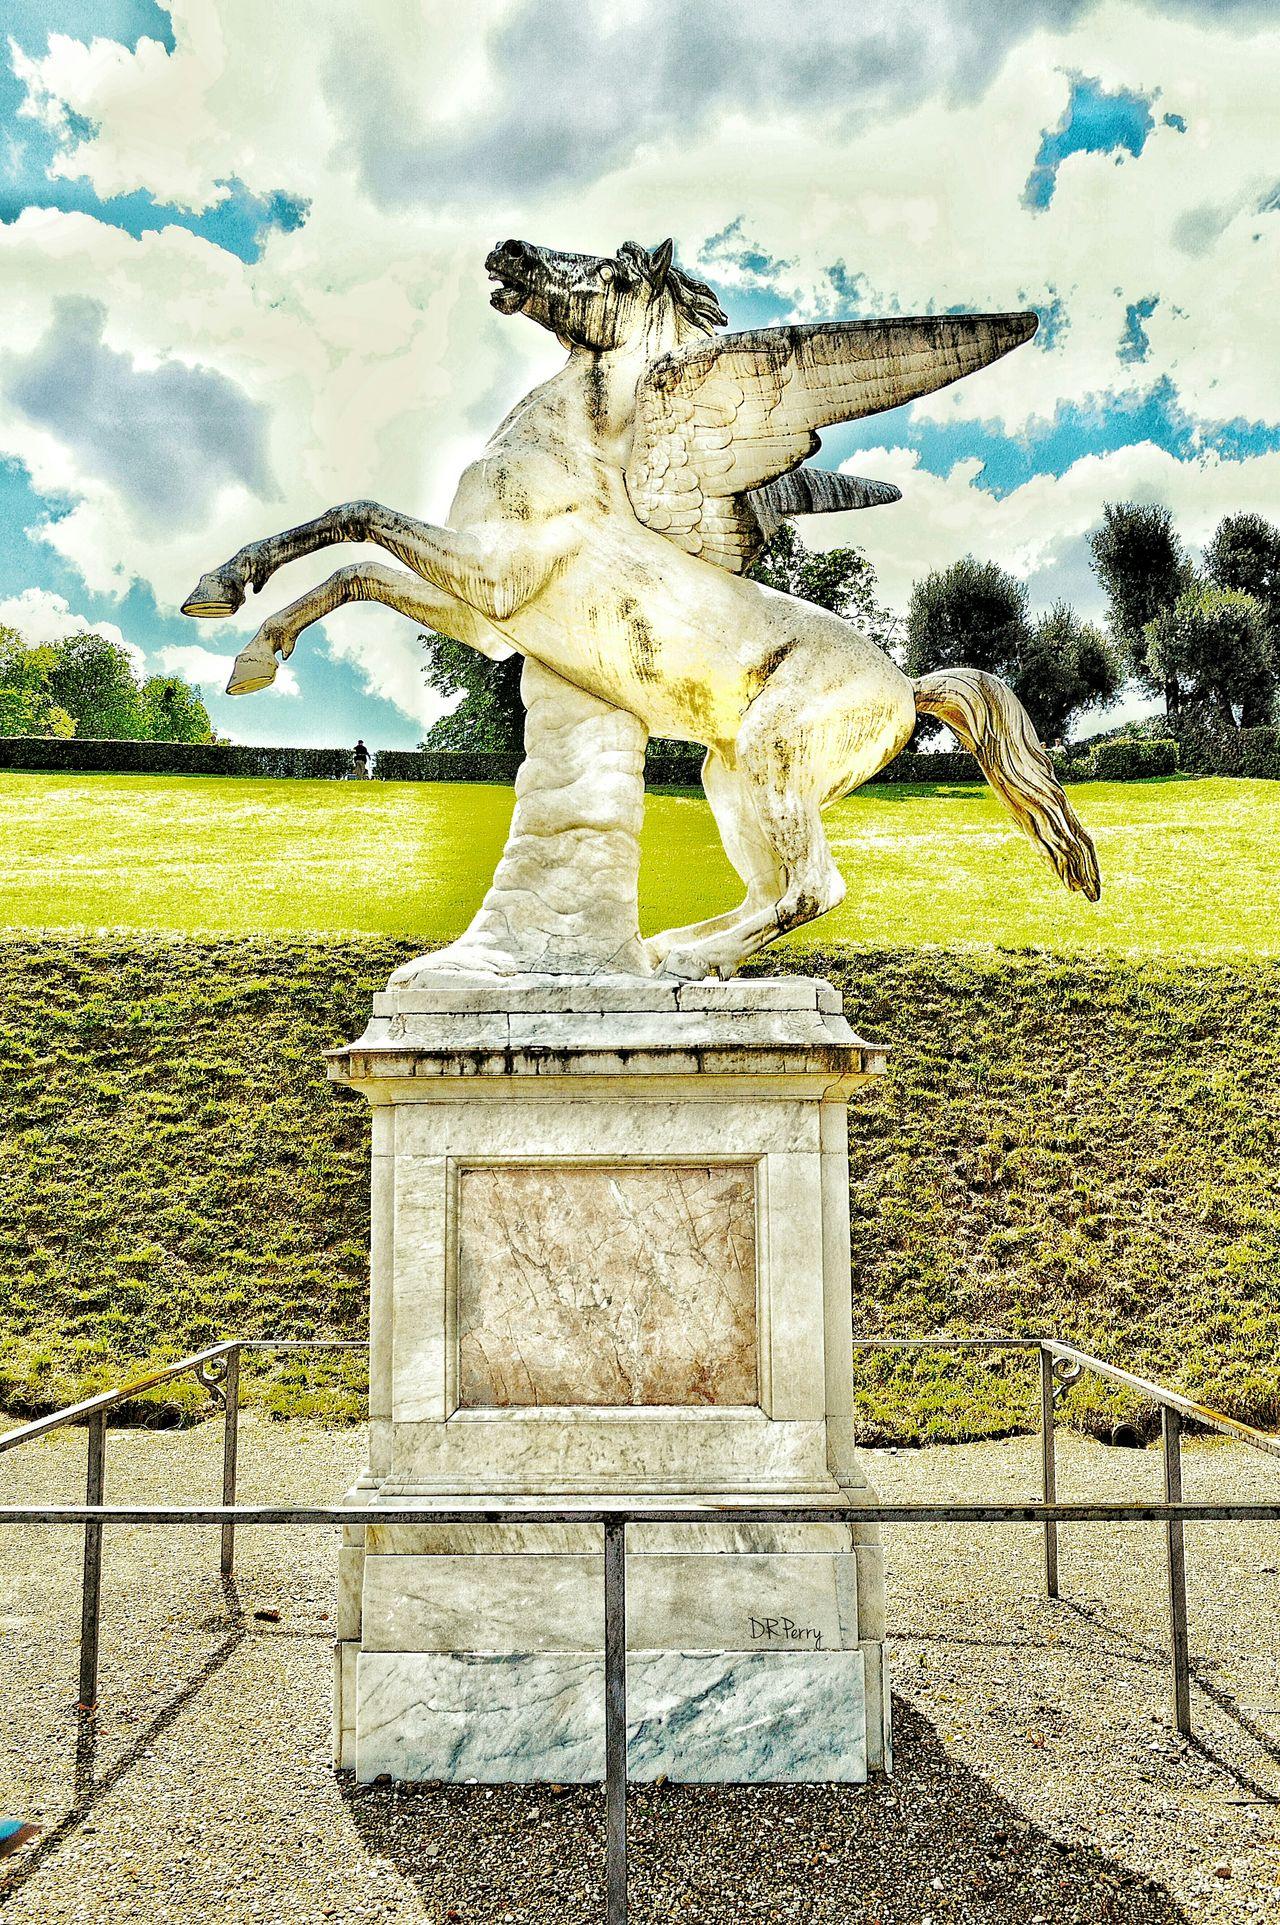 """Pegasus"" - Aristodemo Costoli(1803–1871)Boboli Gardens - Firenze Florence Italy Italia Photobydperry Pegasus Statue Aristodemocostoli Sculpture Boboligardens Boboli Garden Firenze"